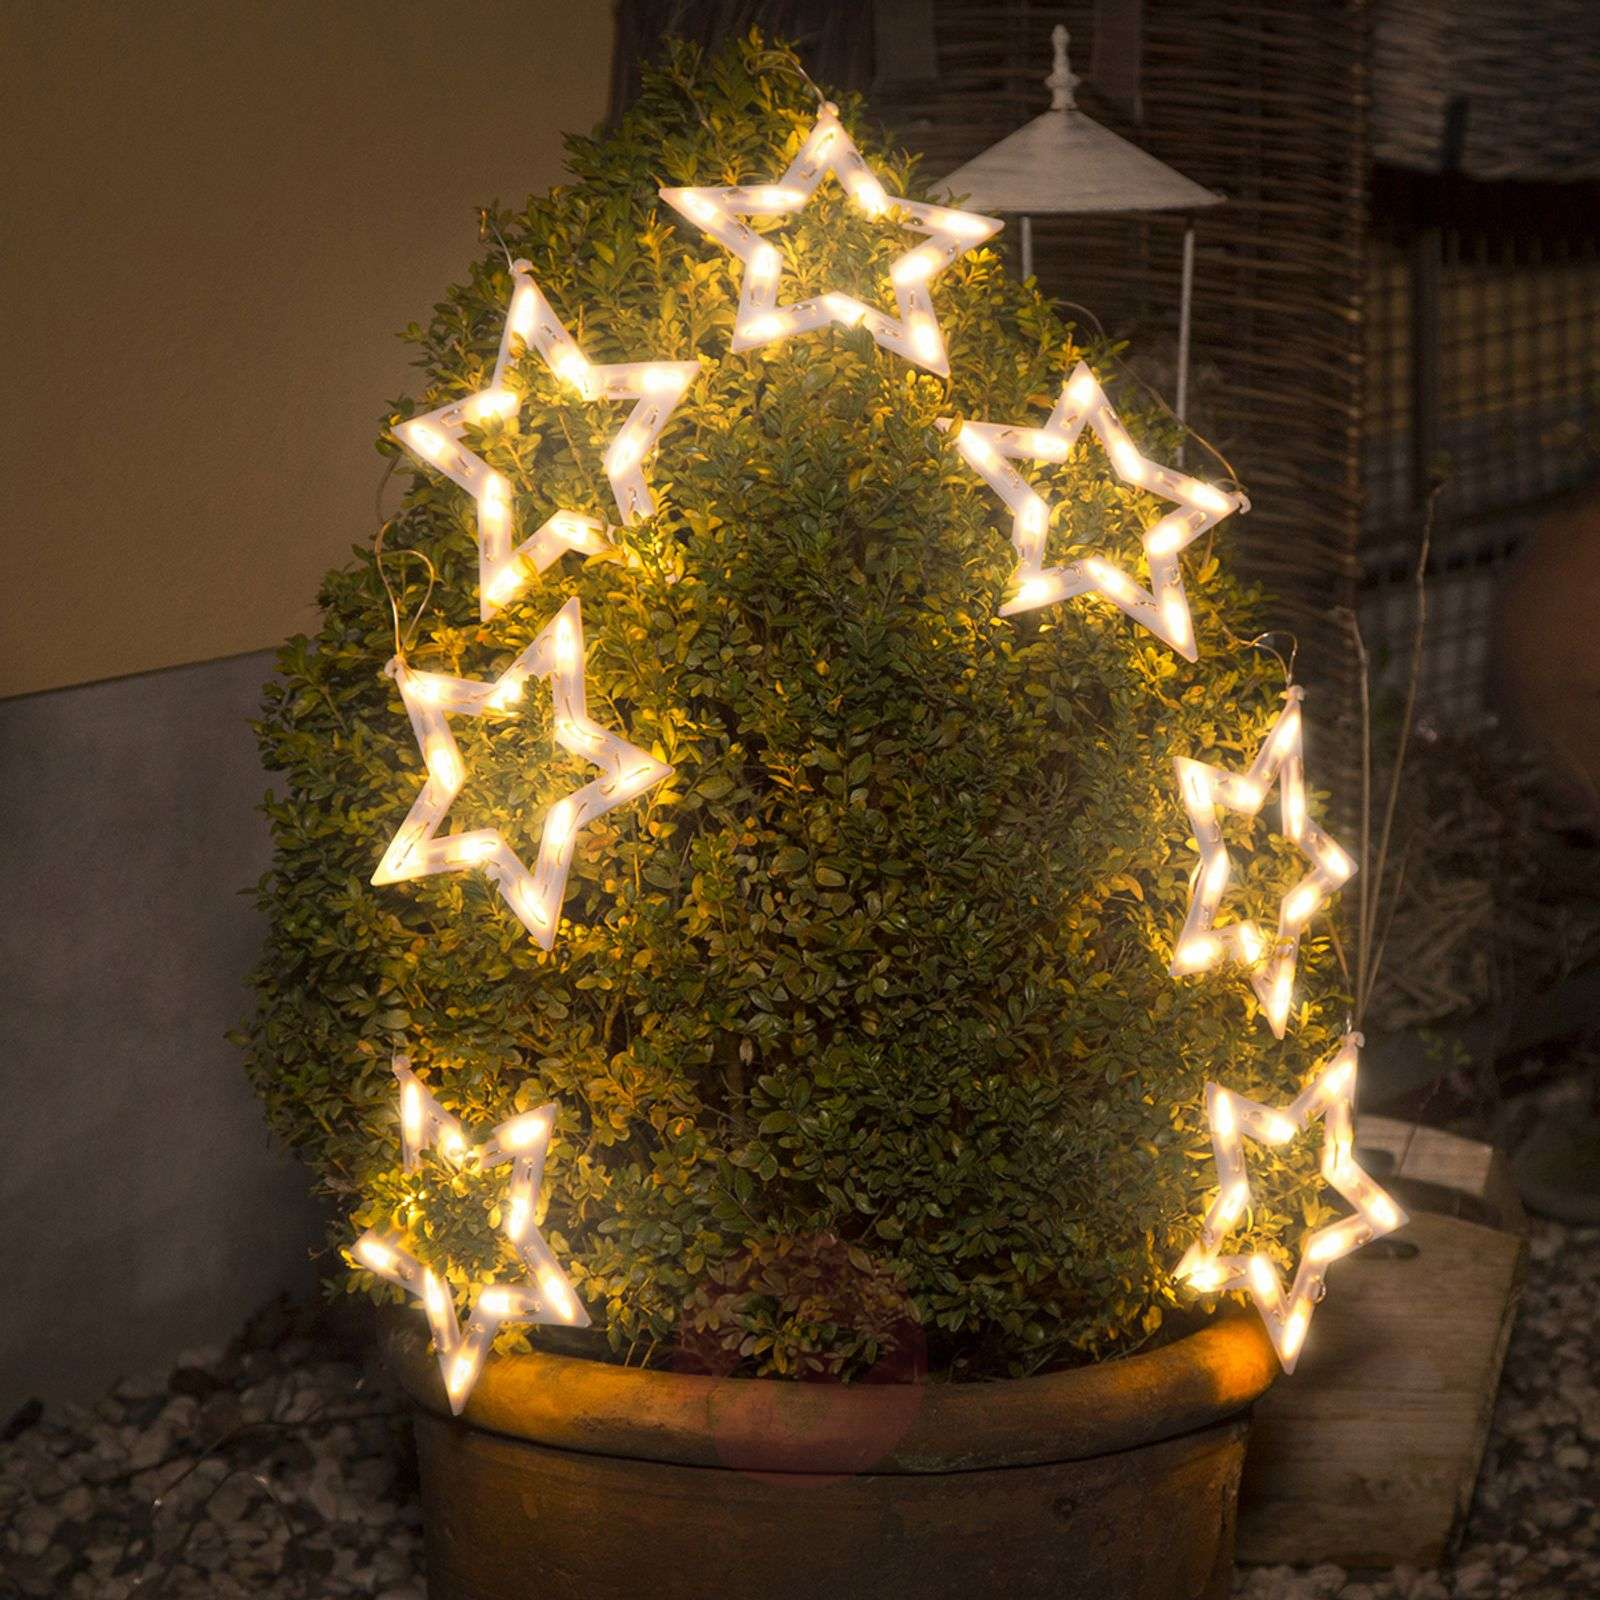 LED-valoverho tähdet 70 lamppua-5524559-01